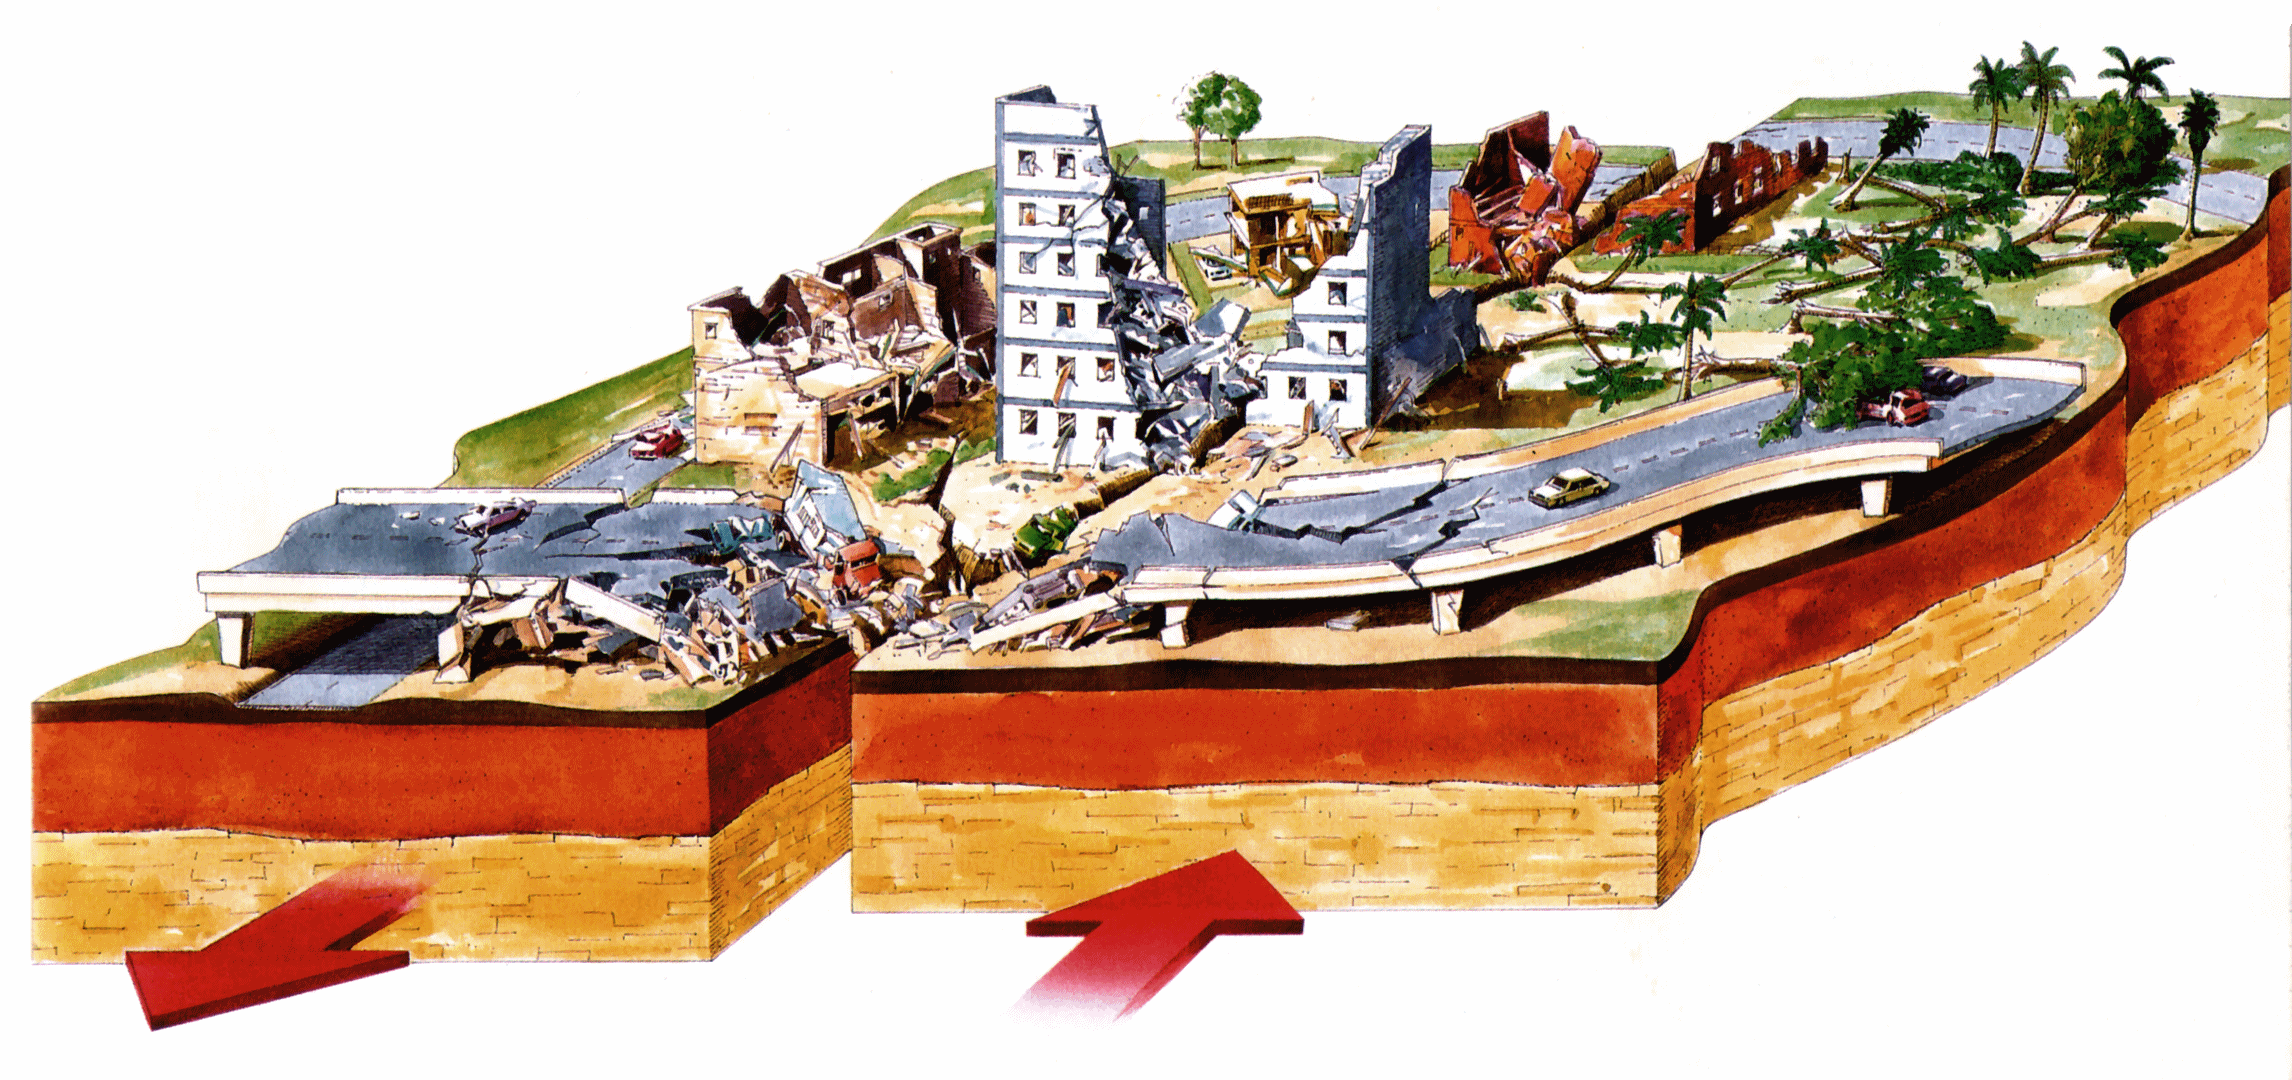 Disaster clipart earthquake damage Emaze Indubitable clipart Free earthquakes